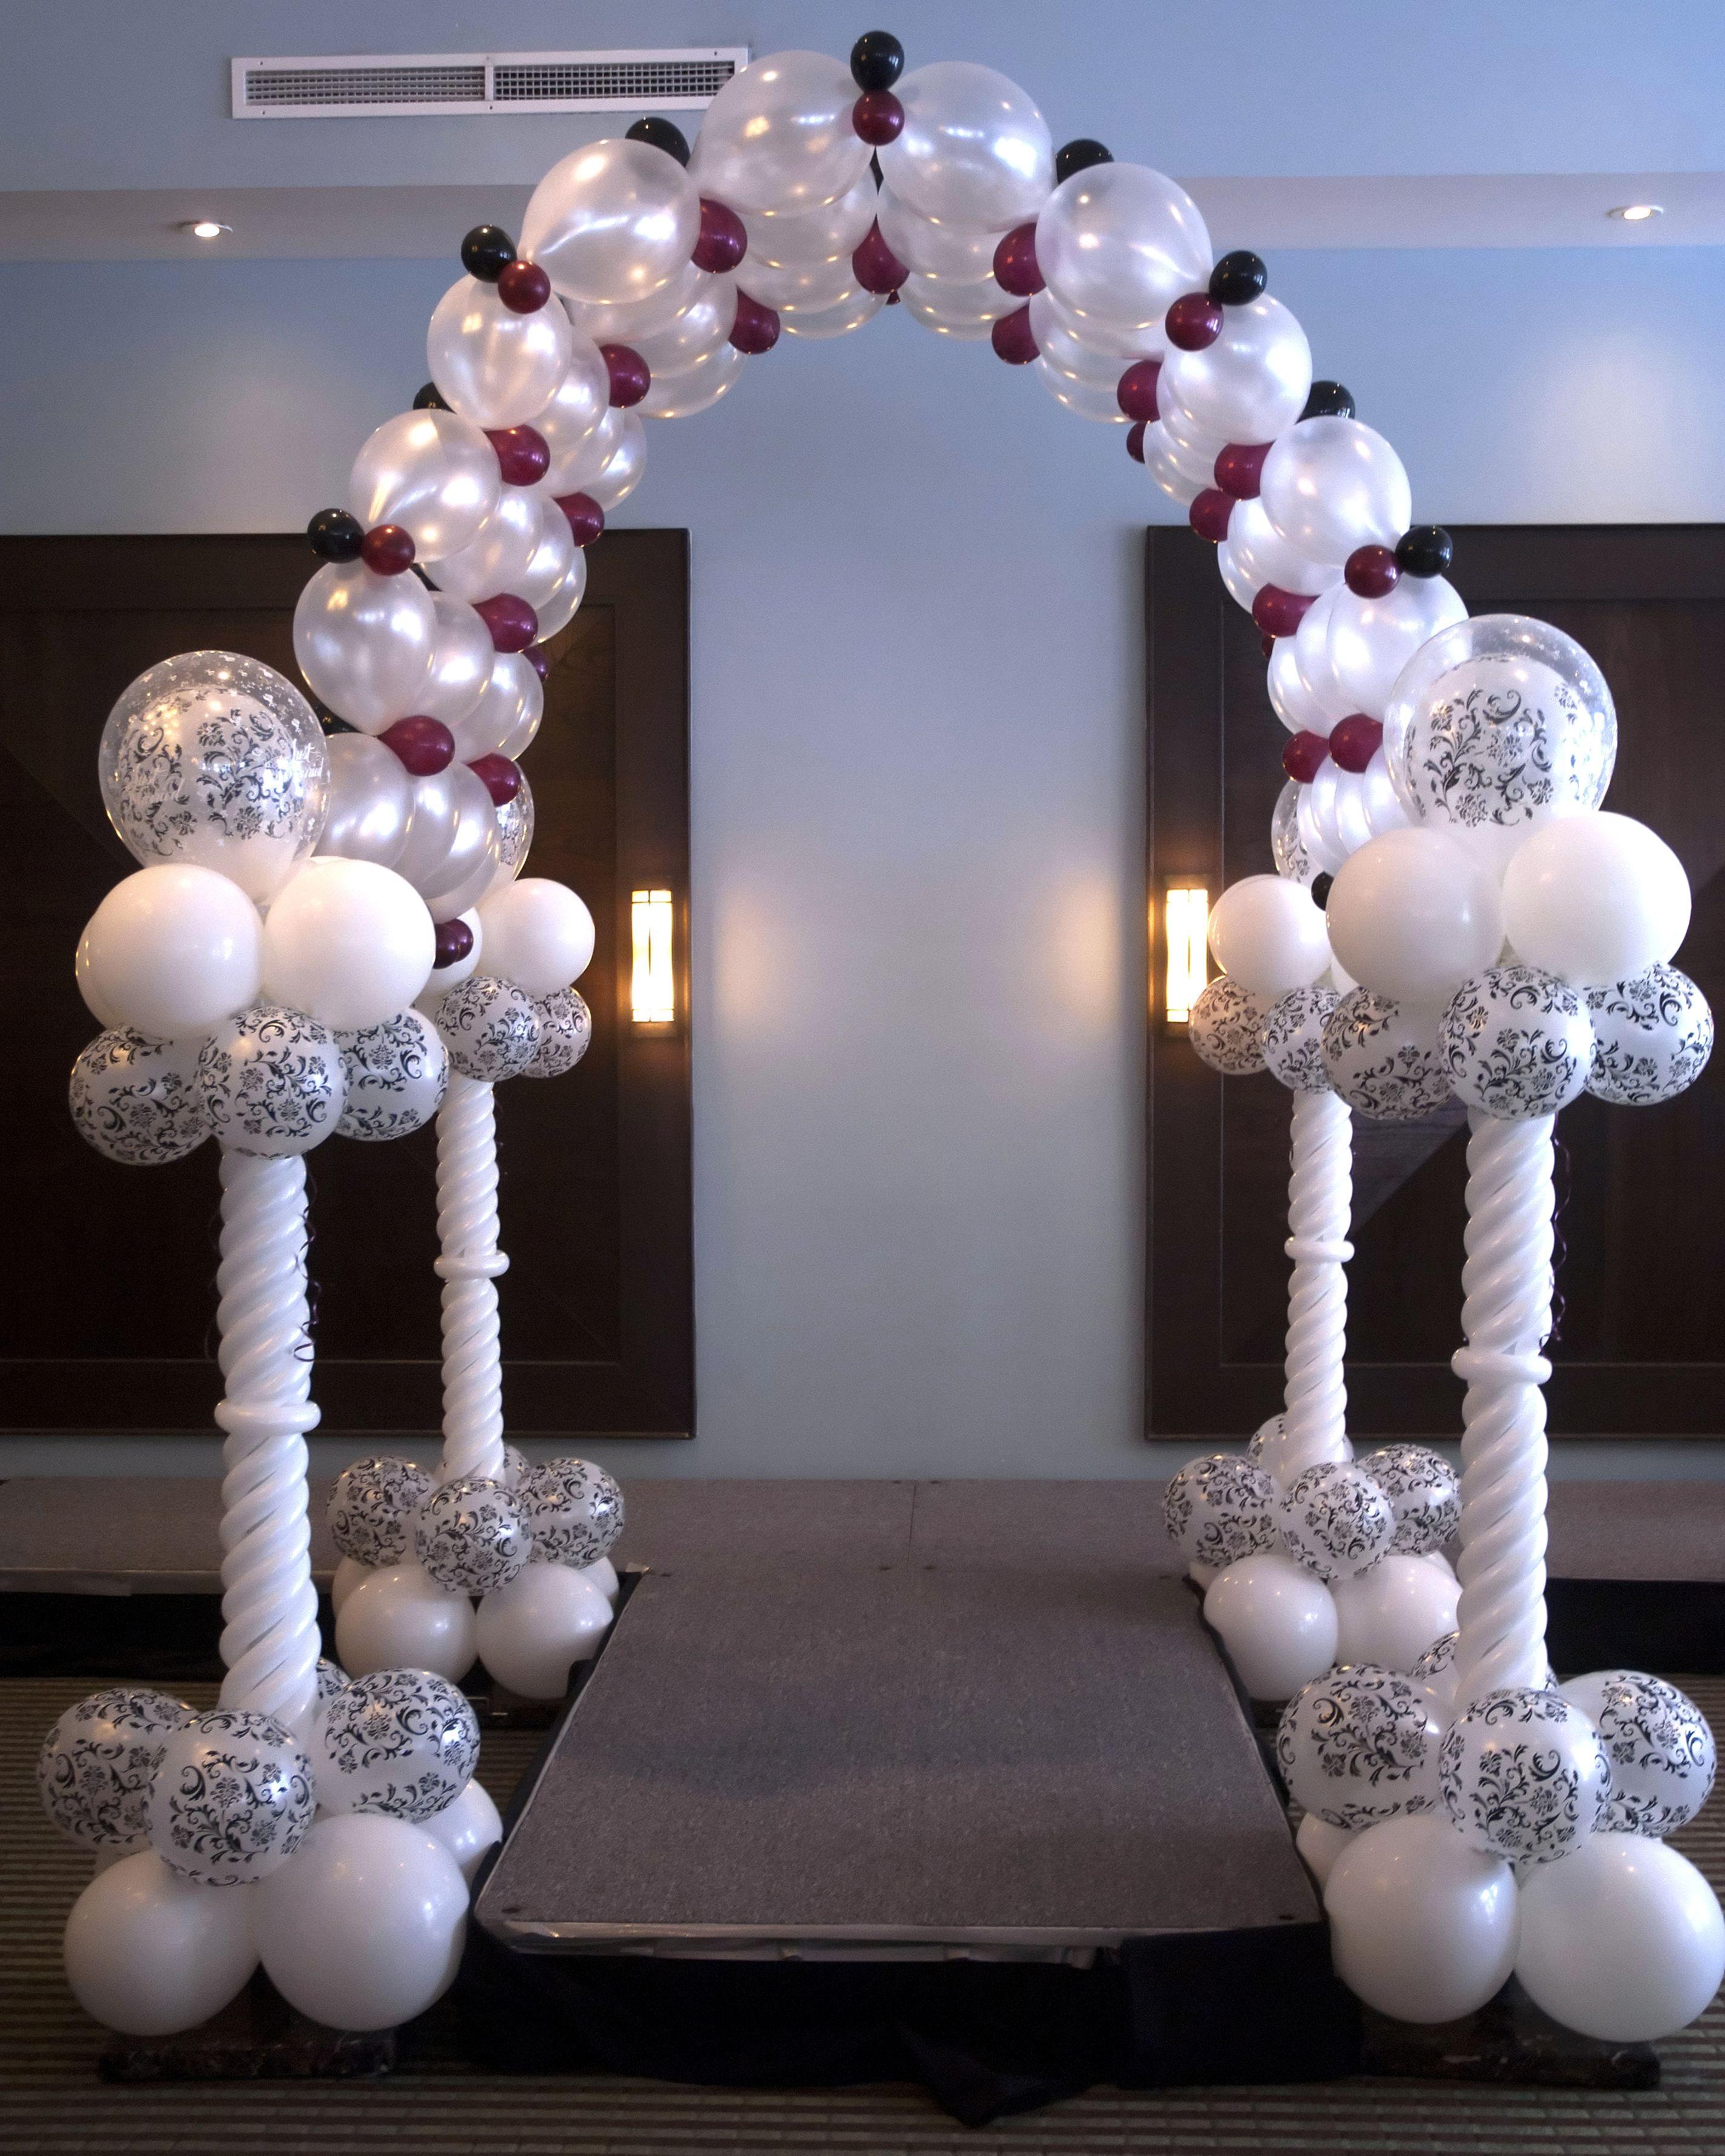 balloon canopy for bridal show runway. #balloon-arch #balloon